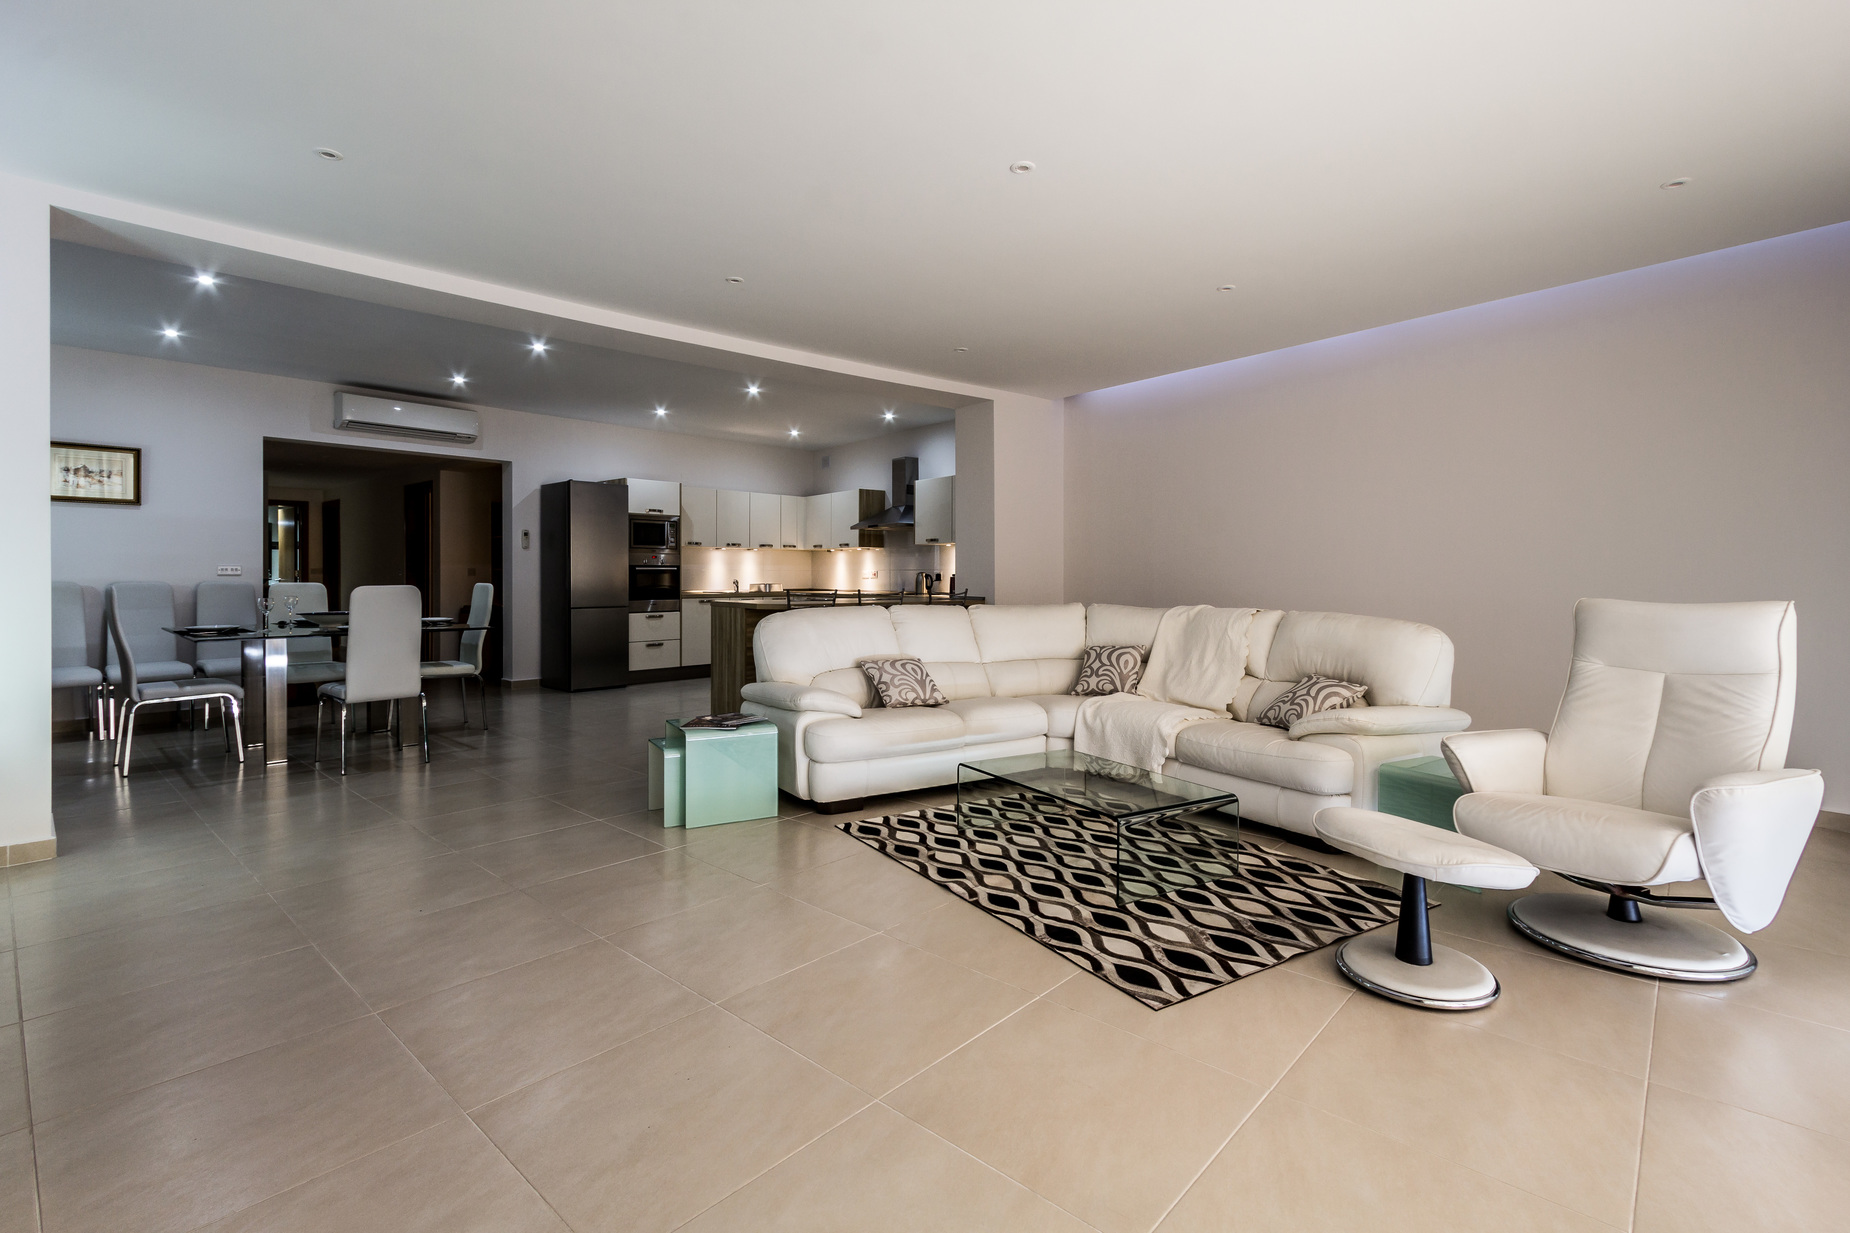 2 bed Apartment For Rent in Marsascala, Marsascala - thumb 2